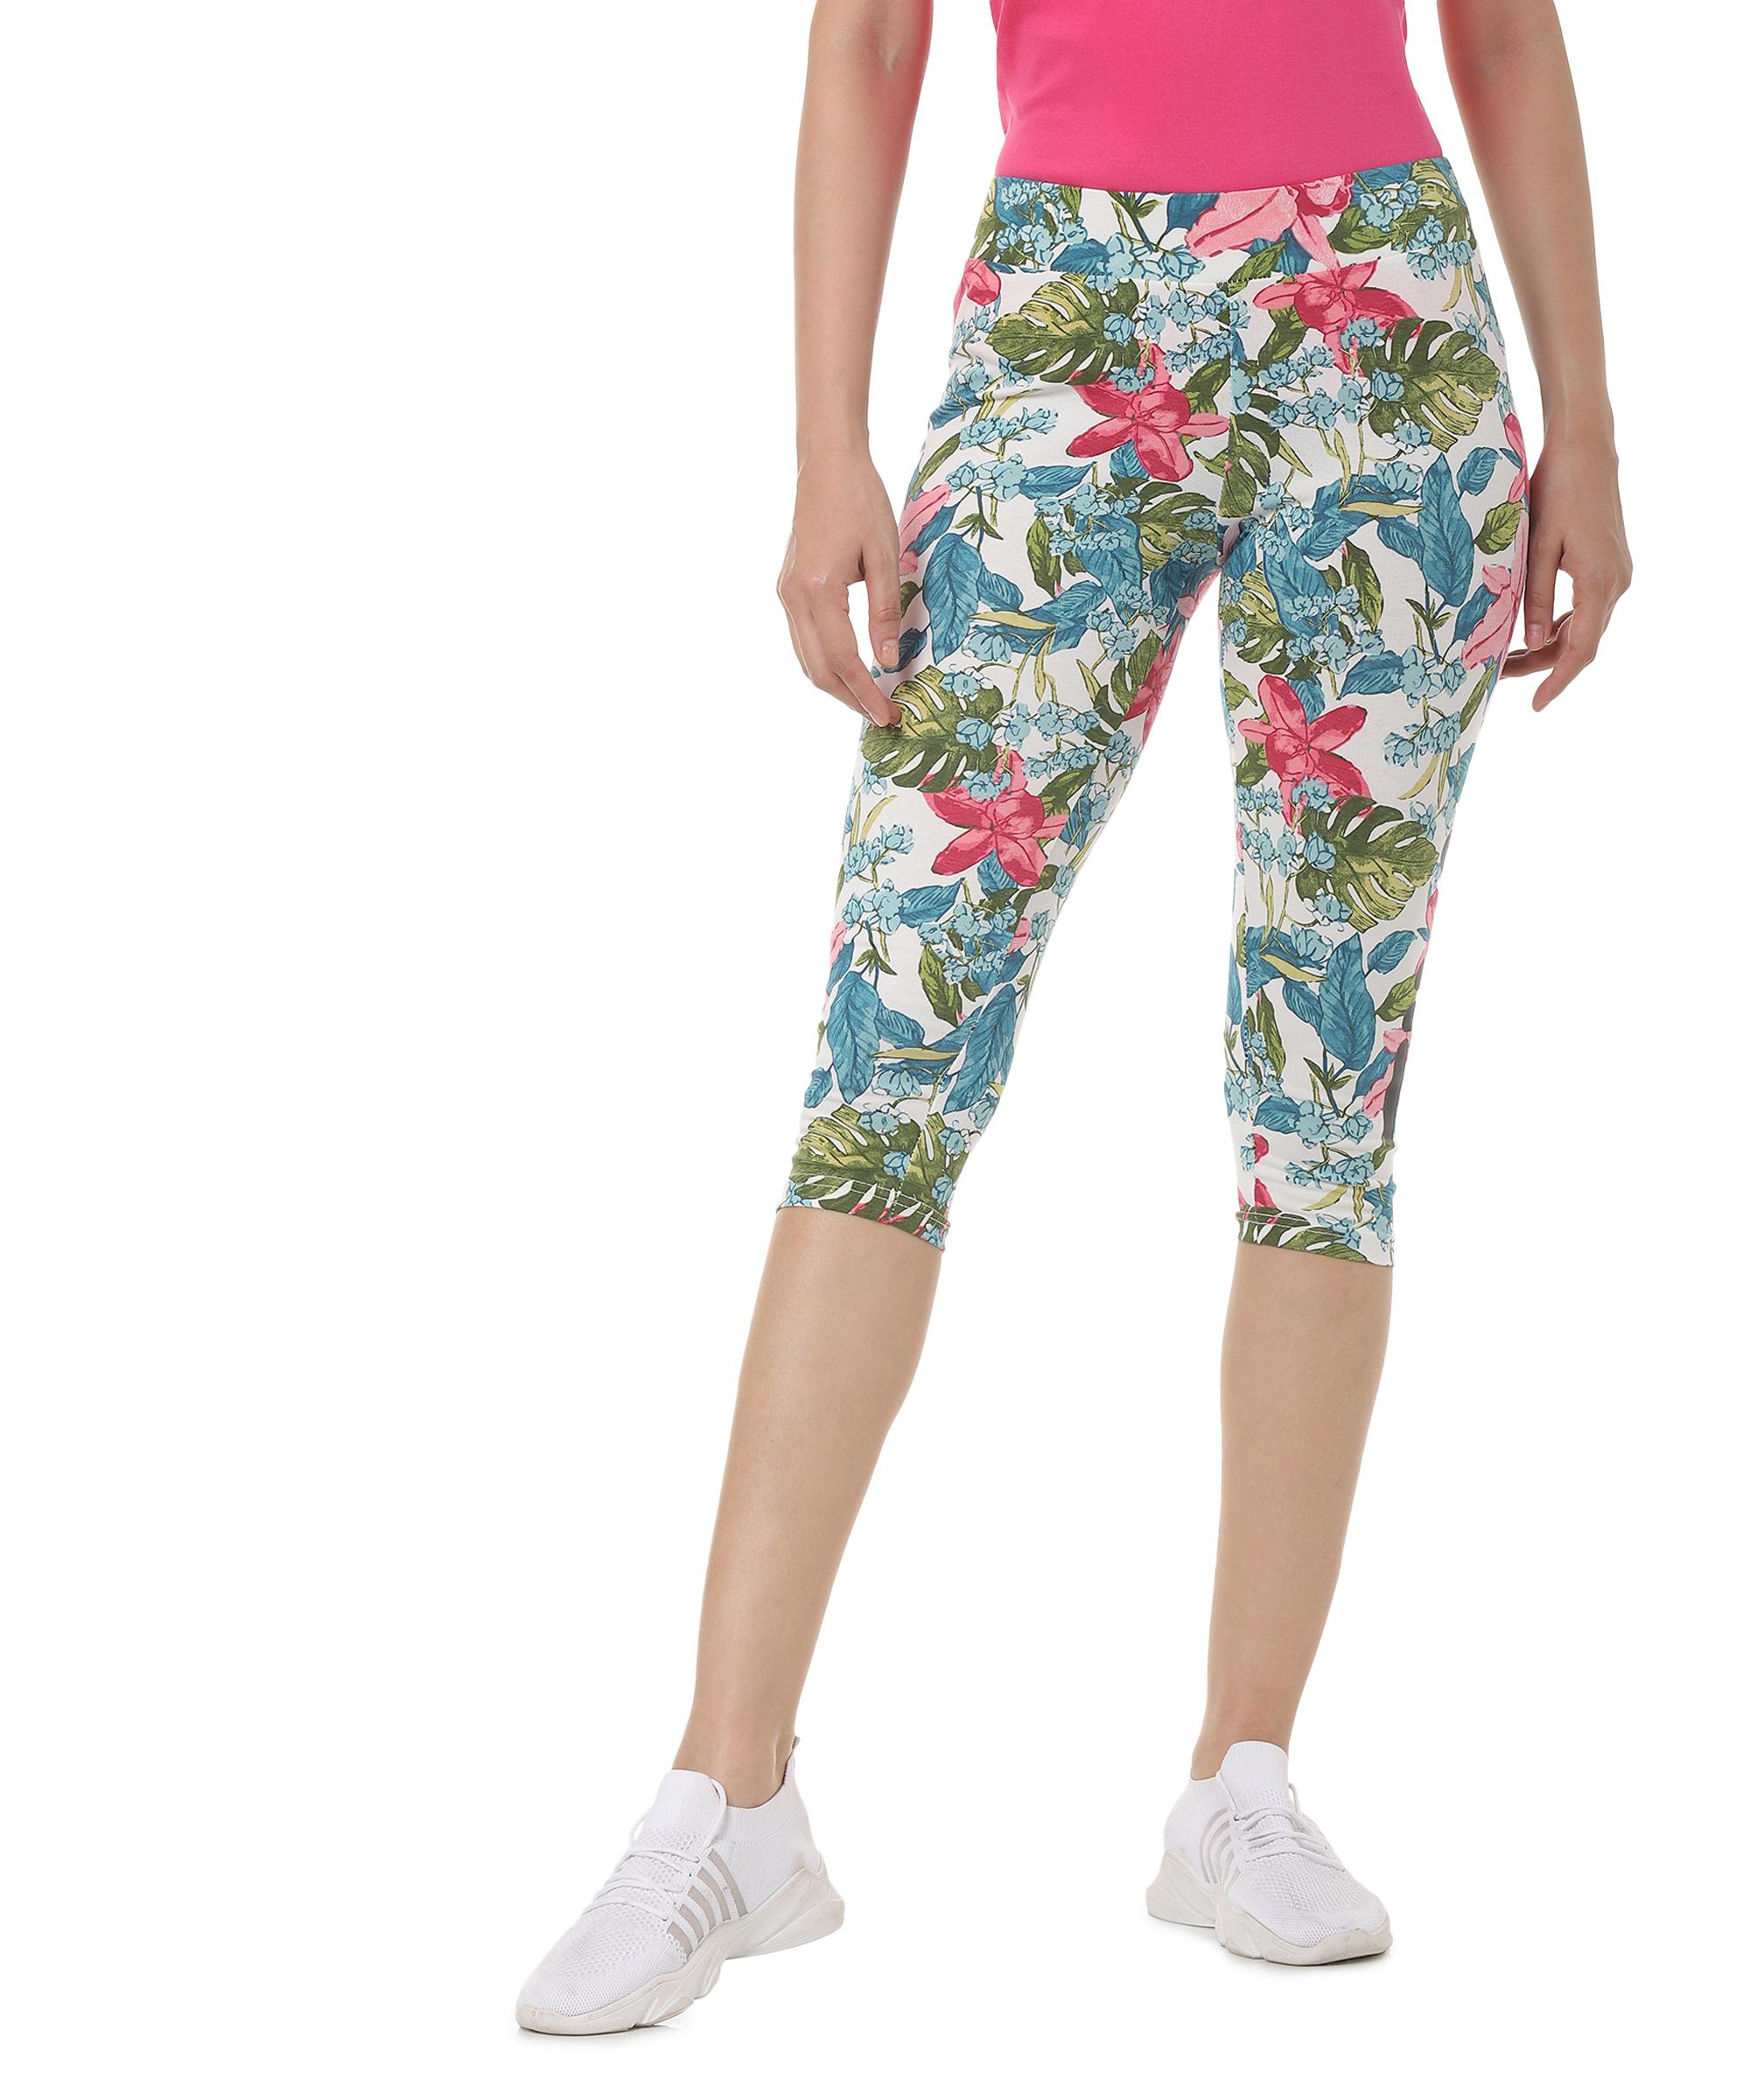 FILA | Multi Activewear Leggings